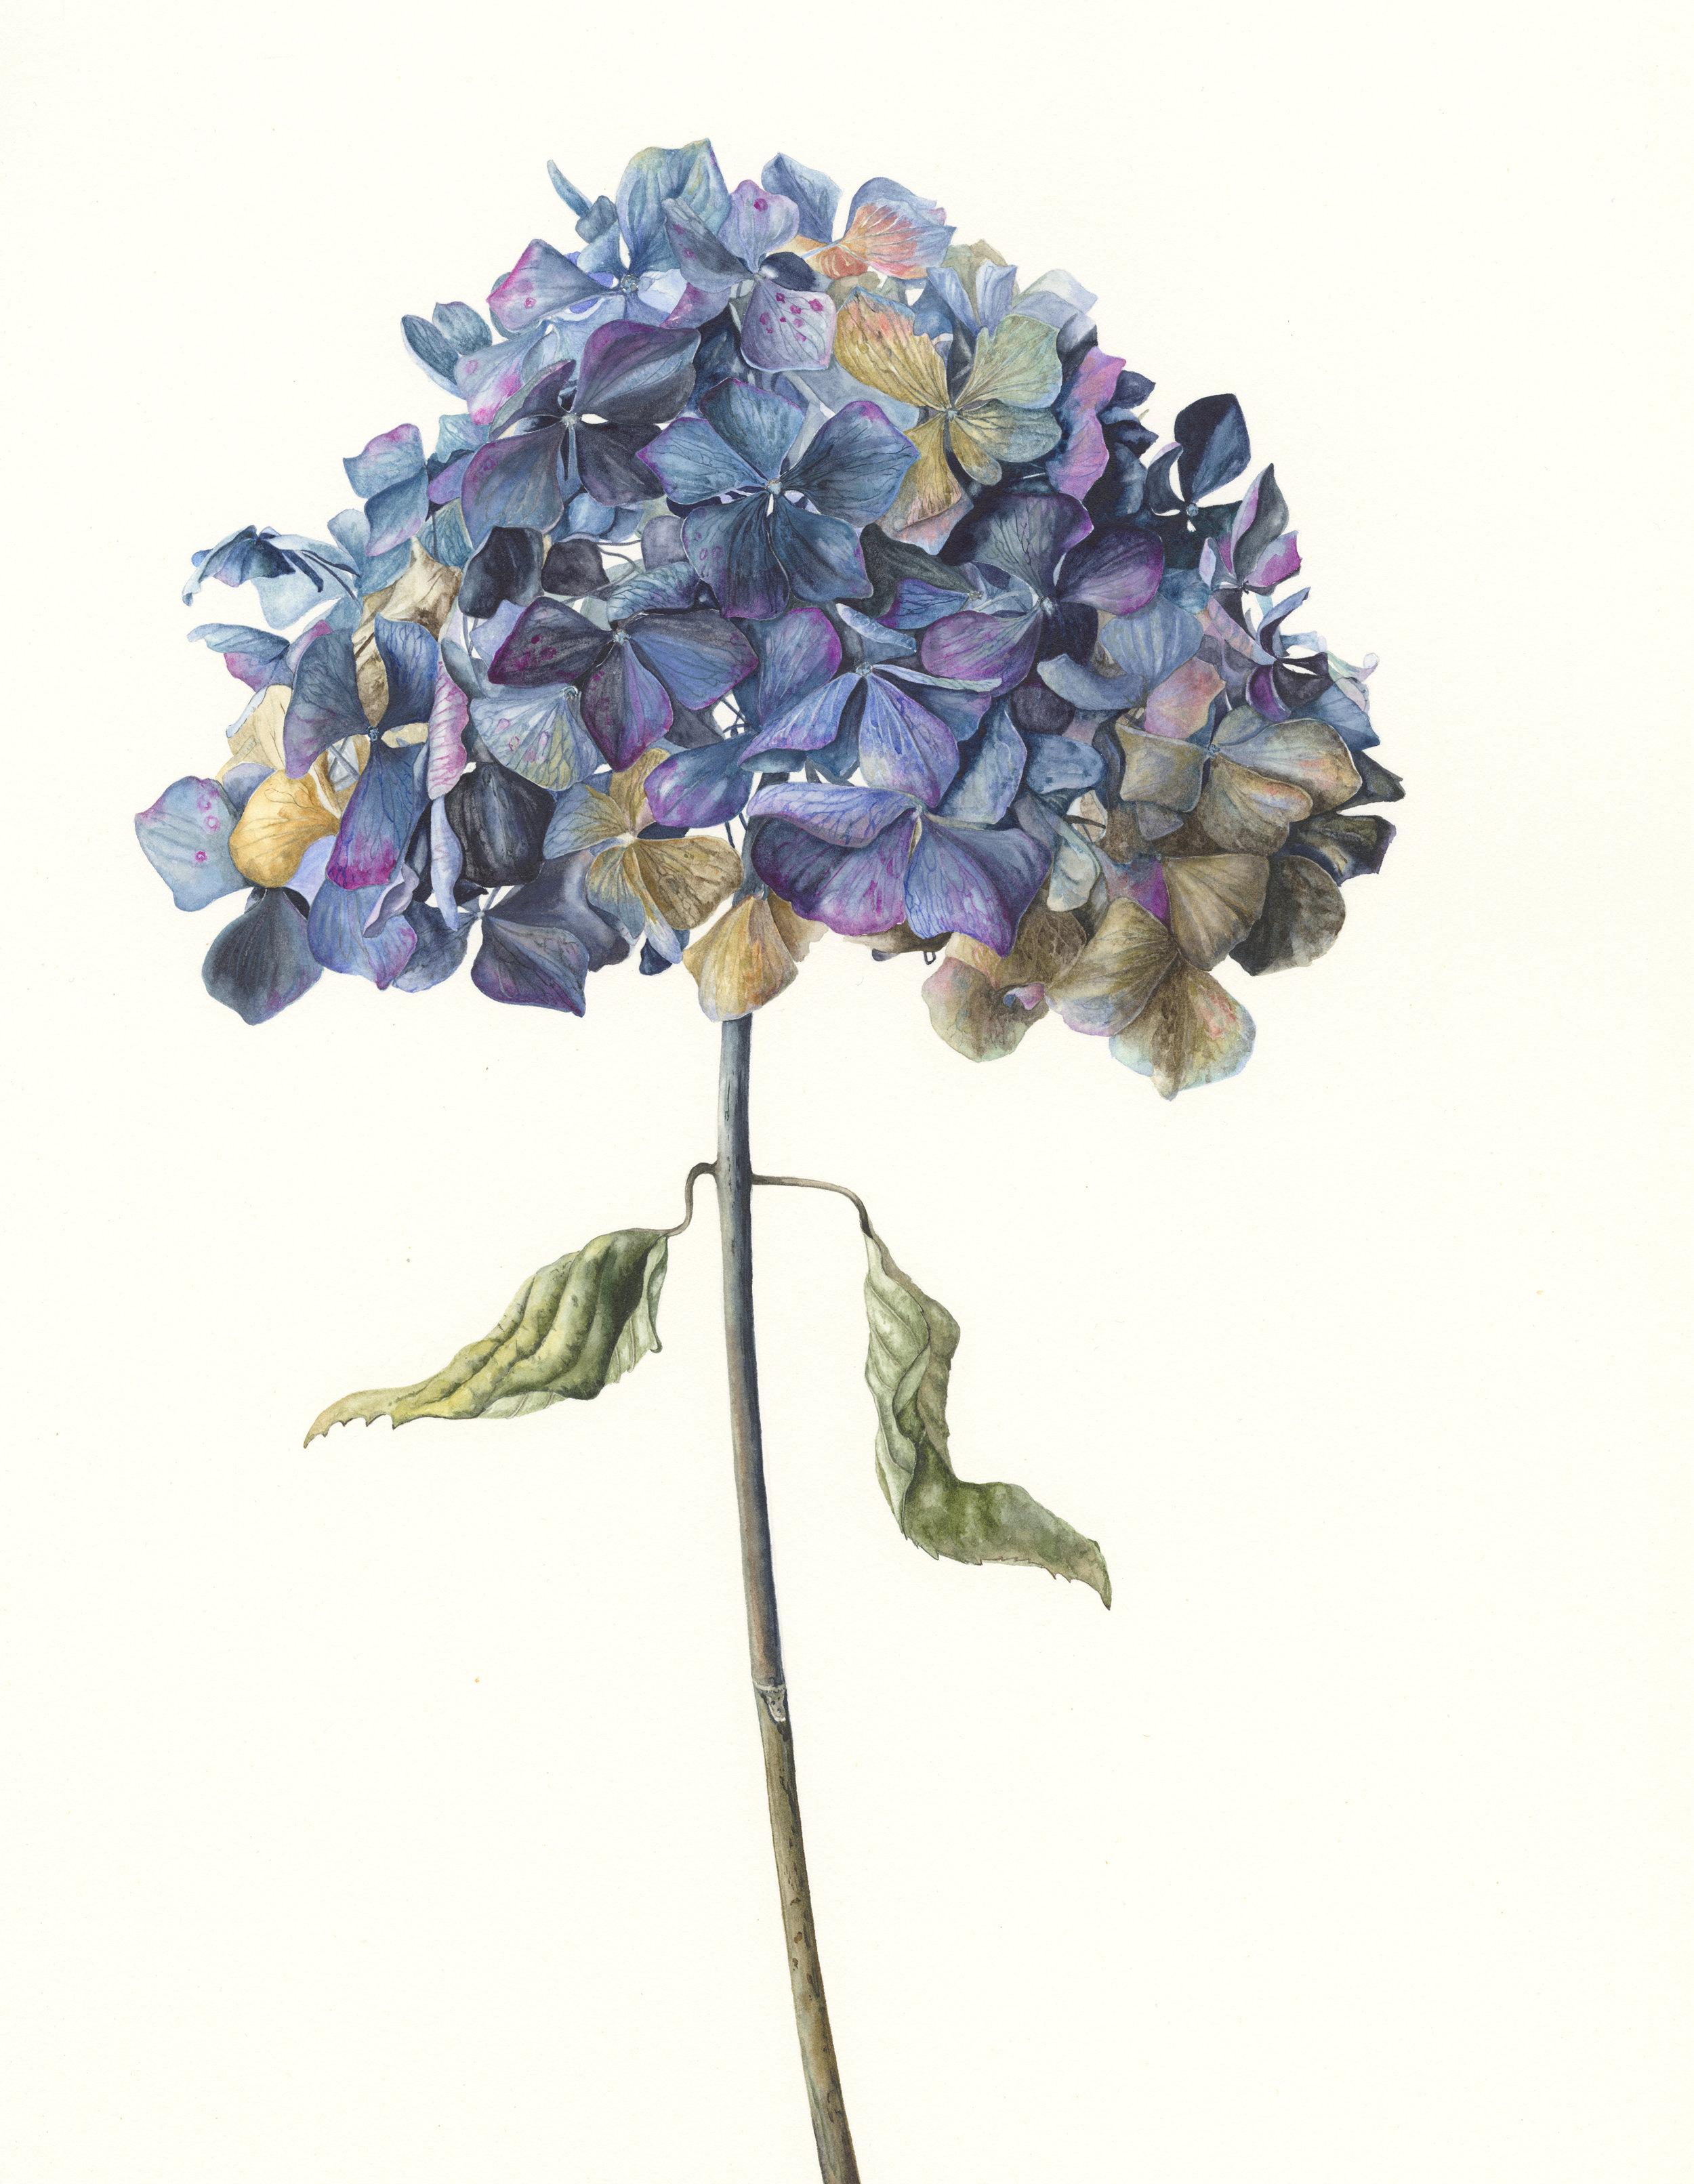 Hydrangea Macrophylla 'Enziandom'  watercolour on paper  30 x 43 cm image  53 x 68 cm framed  £1800